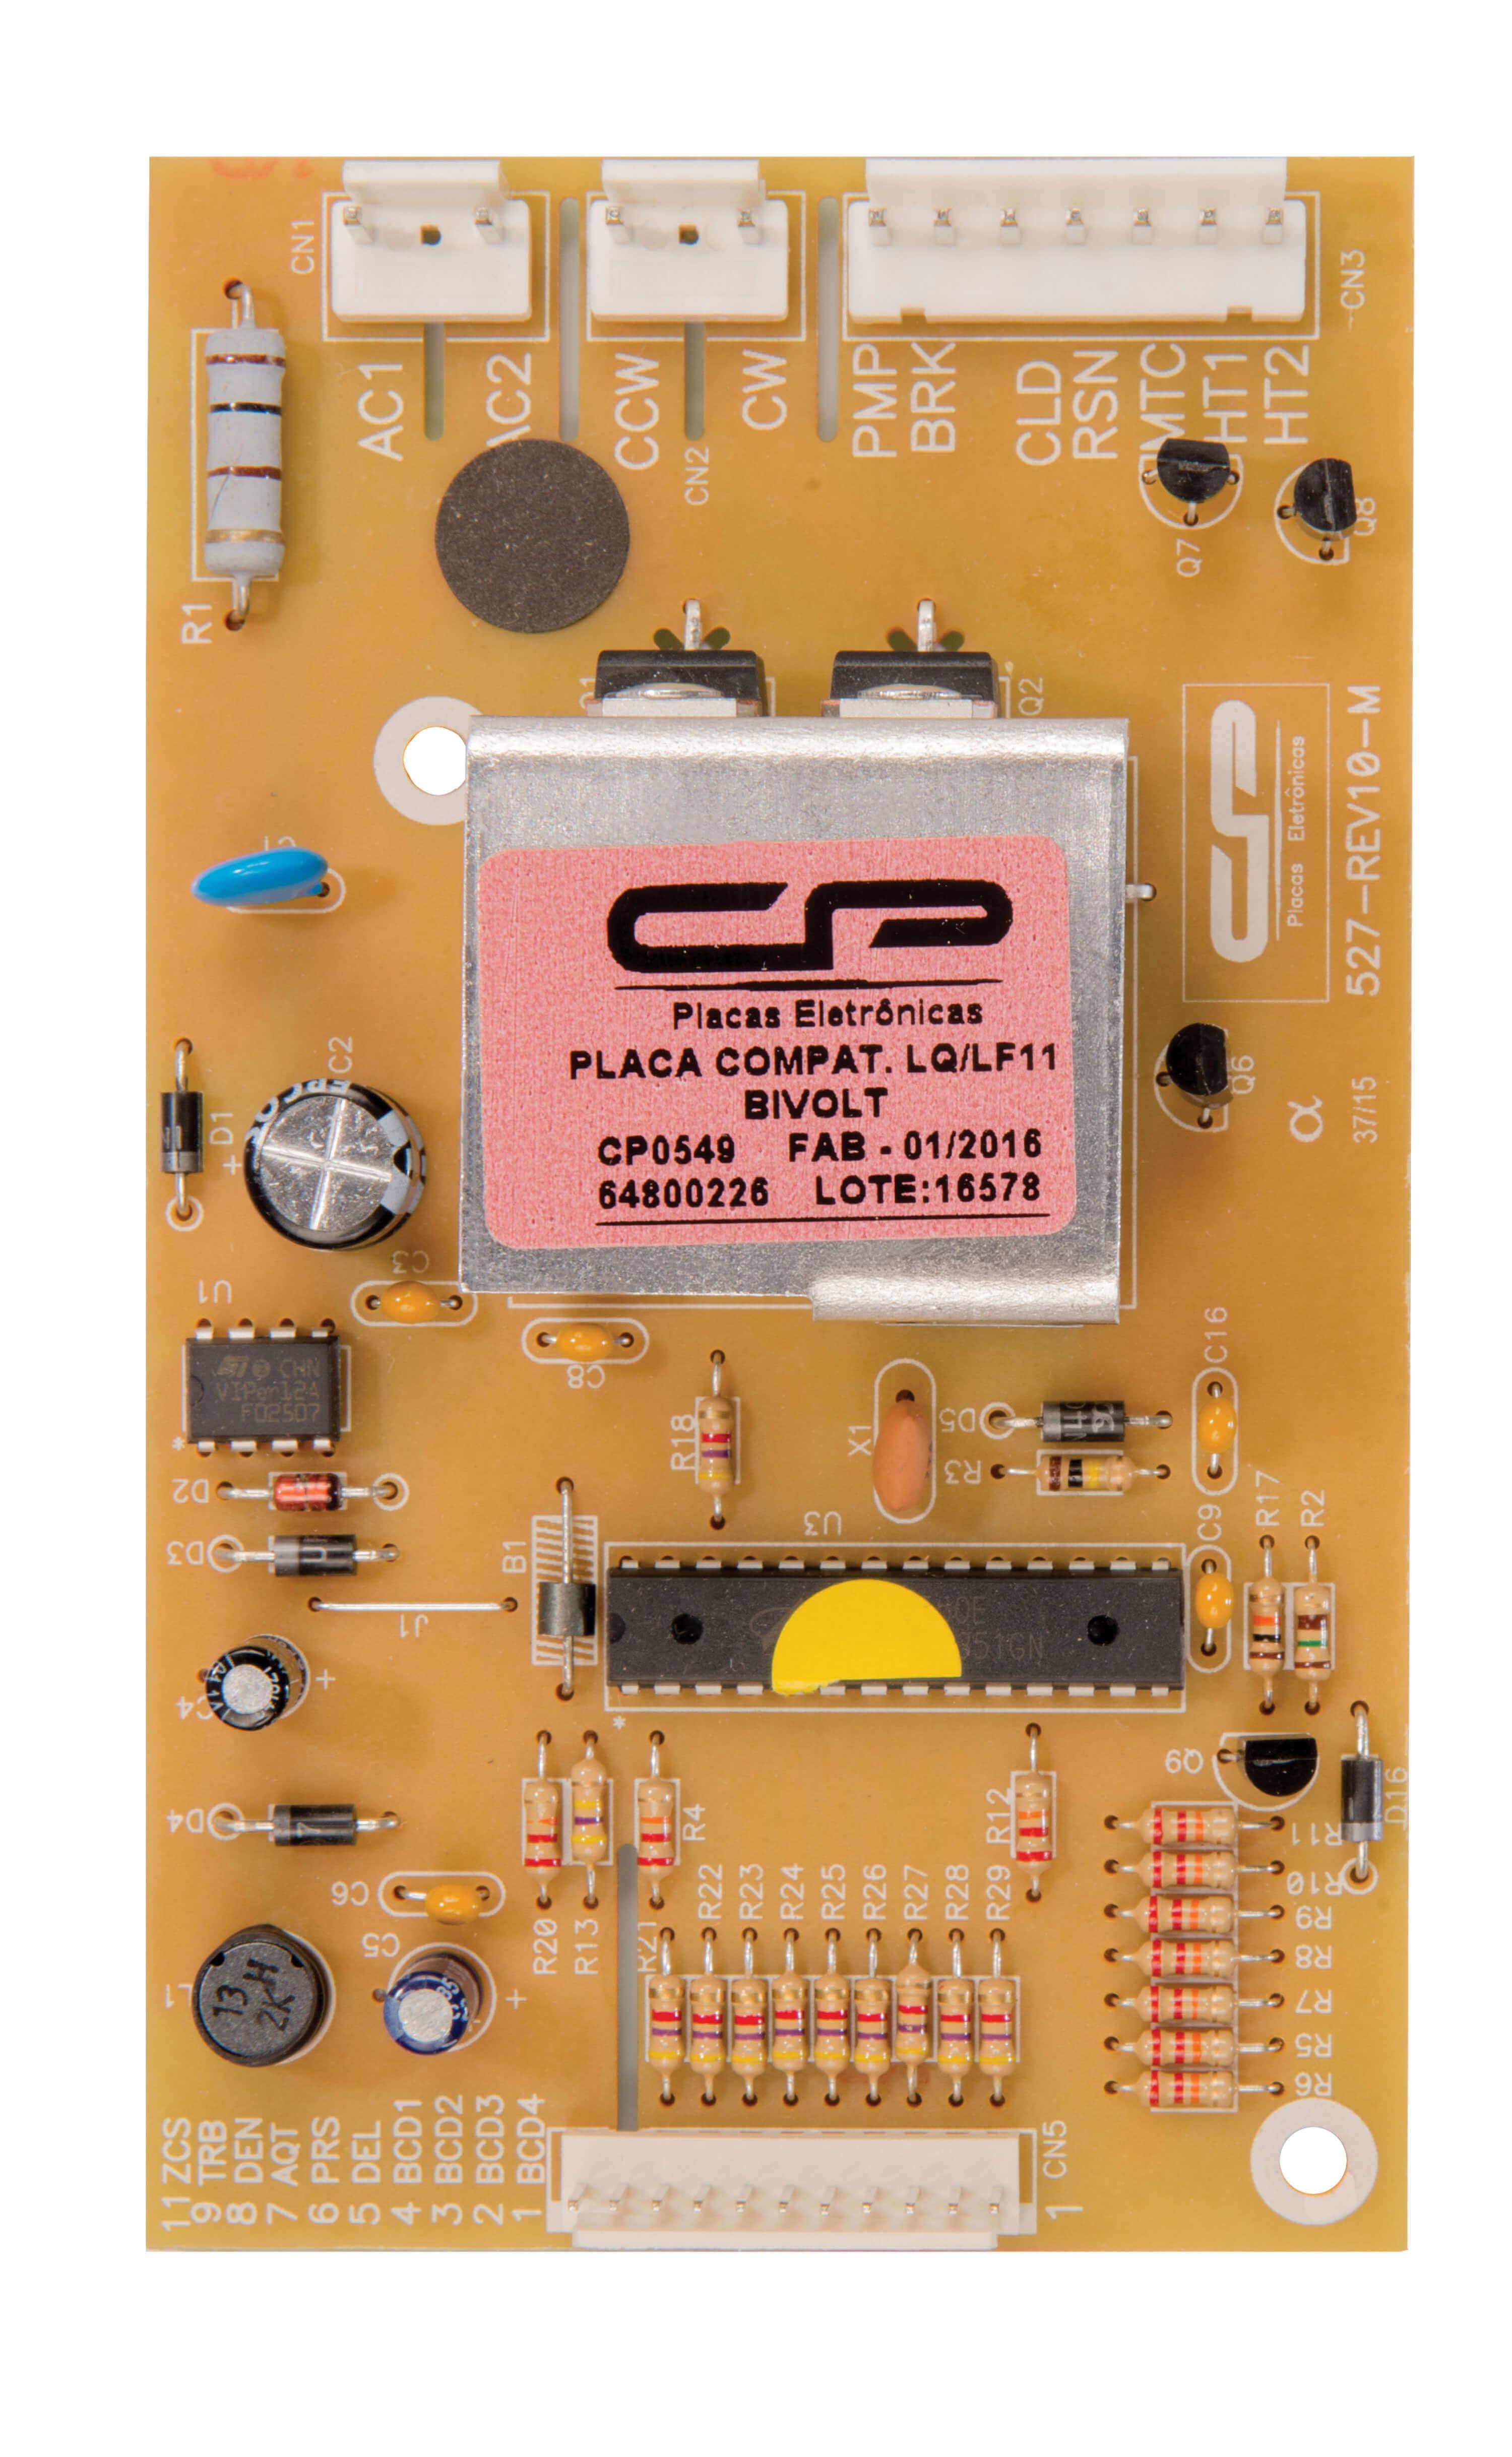 CP 0549 - Placa compatível lavadora LQ/ LF11 bivolt